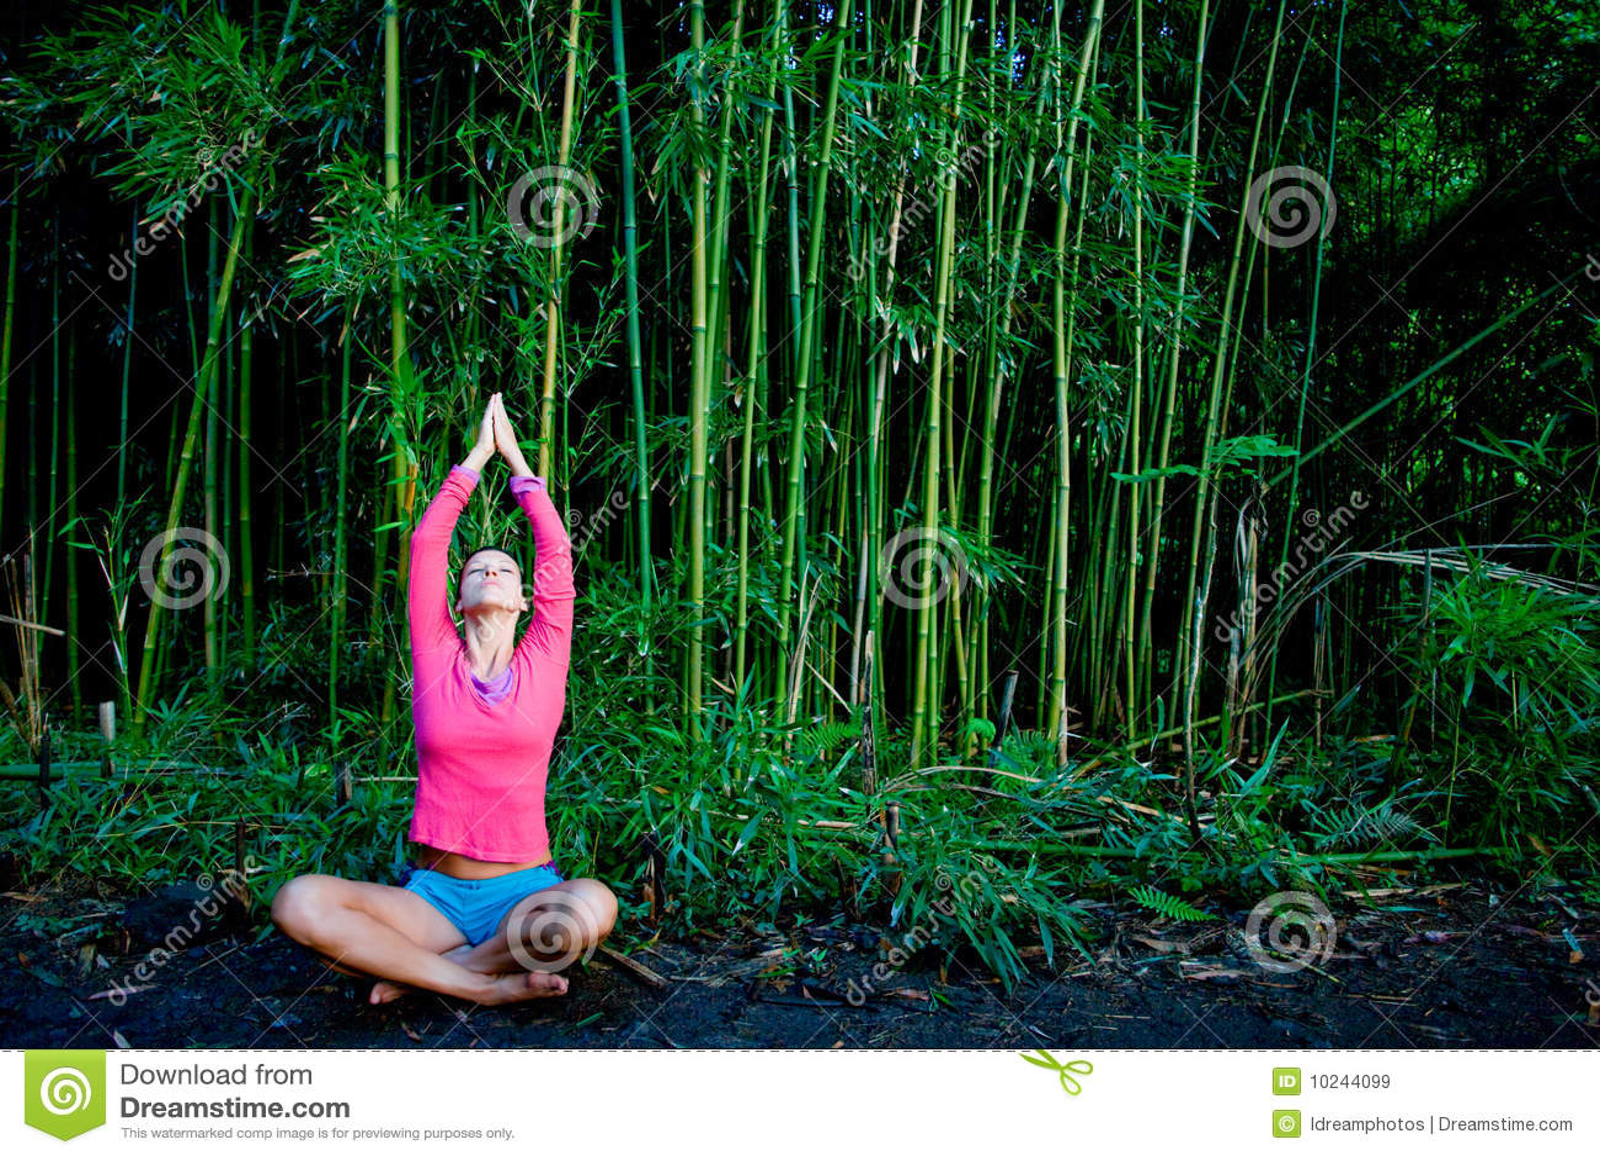 Yoga Bamboo Royalty Free Stock Images - Image: 10244099